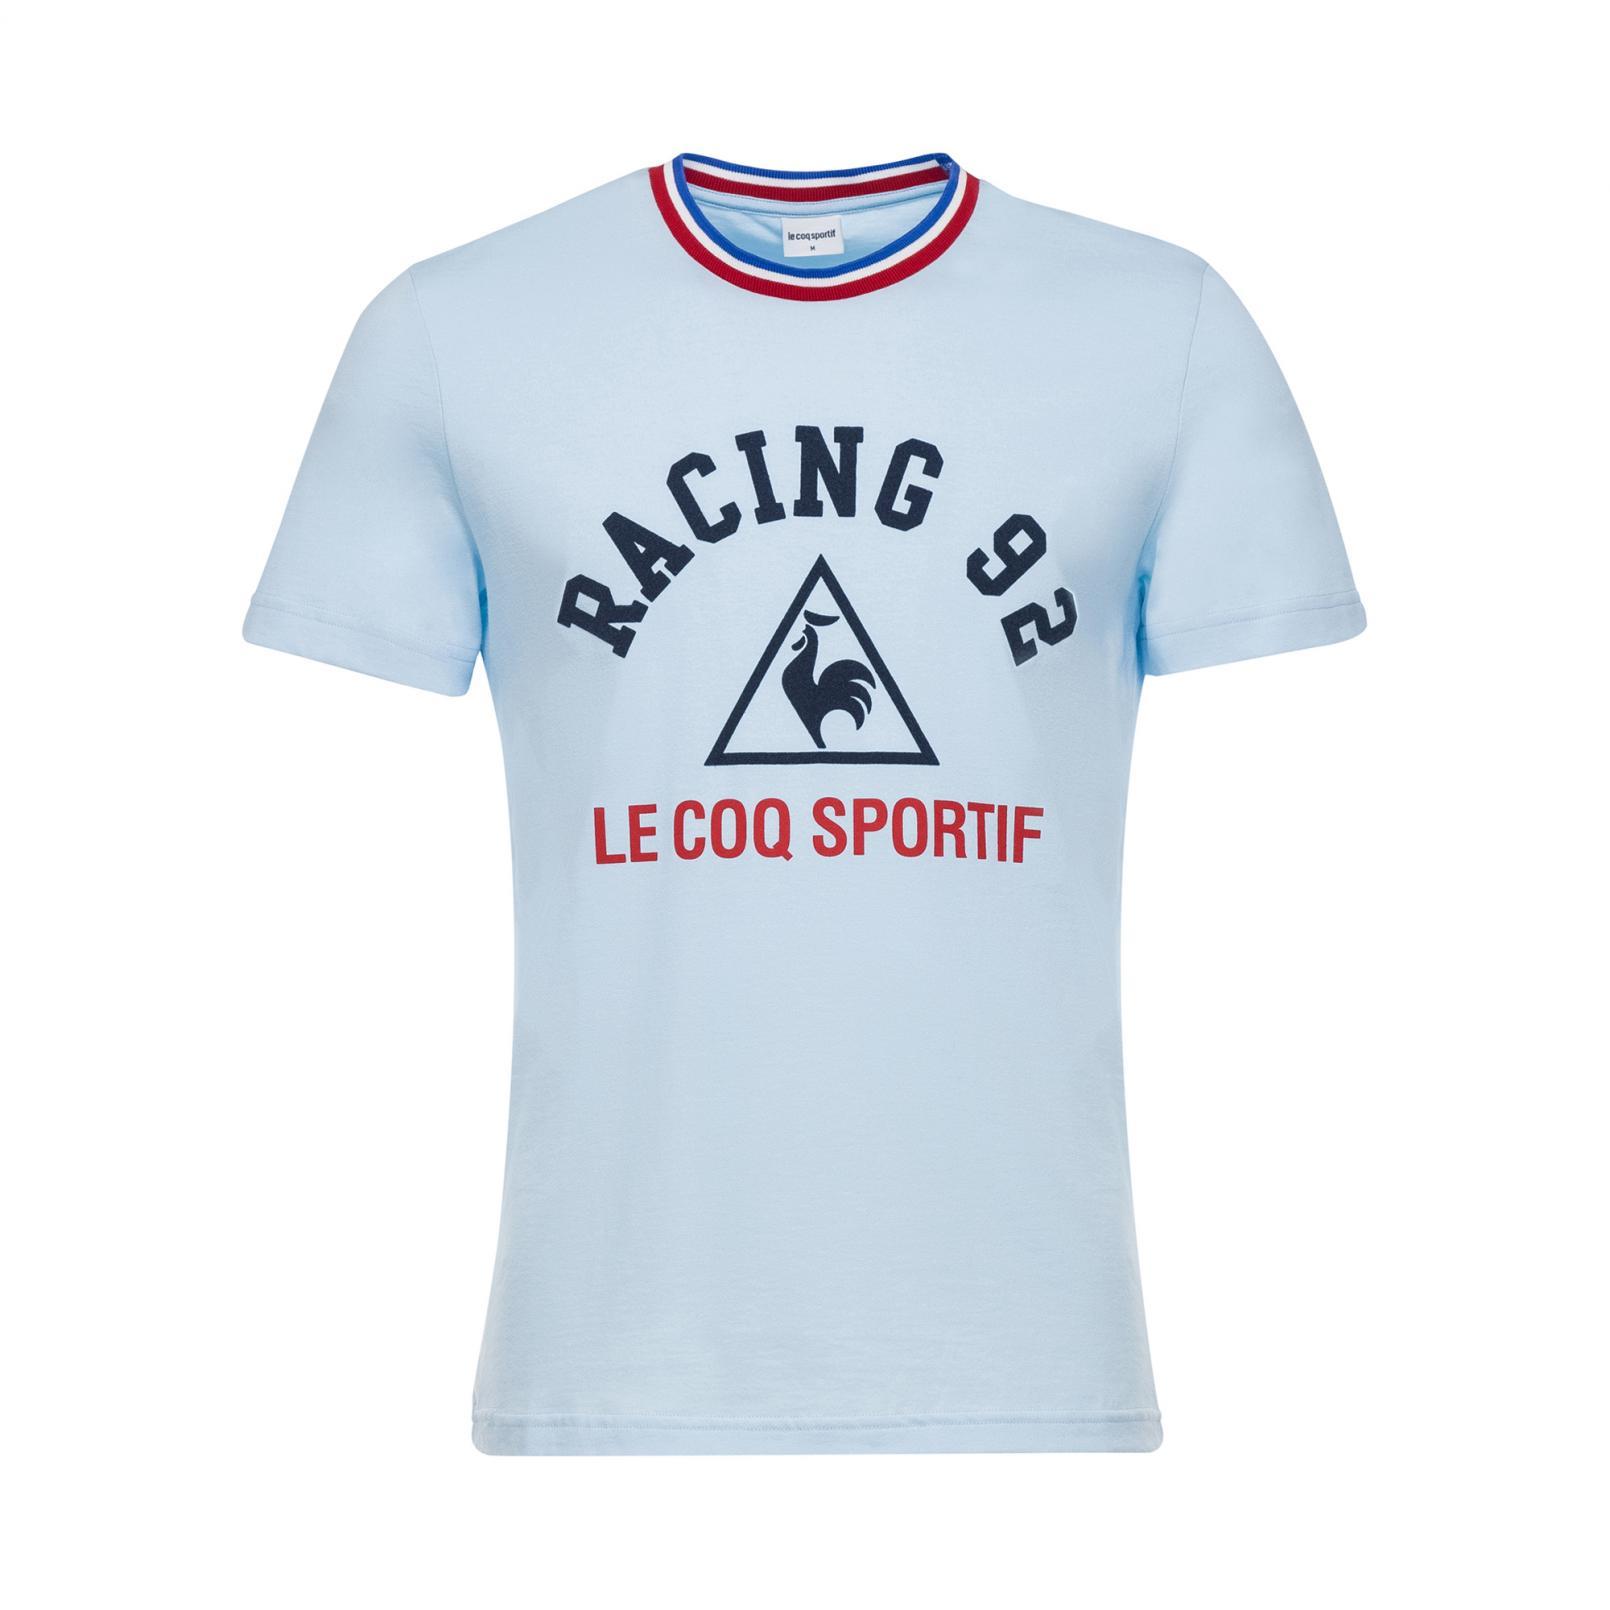 T-shirts – Le Coq Sportif Racing 92 Presentation T-shirt Light Blue